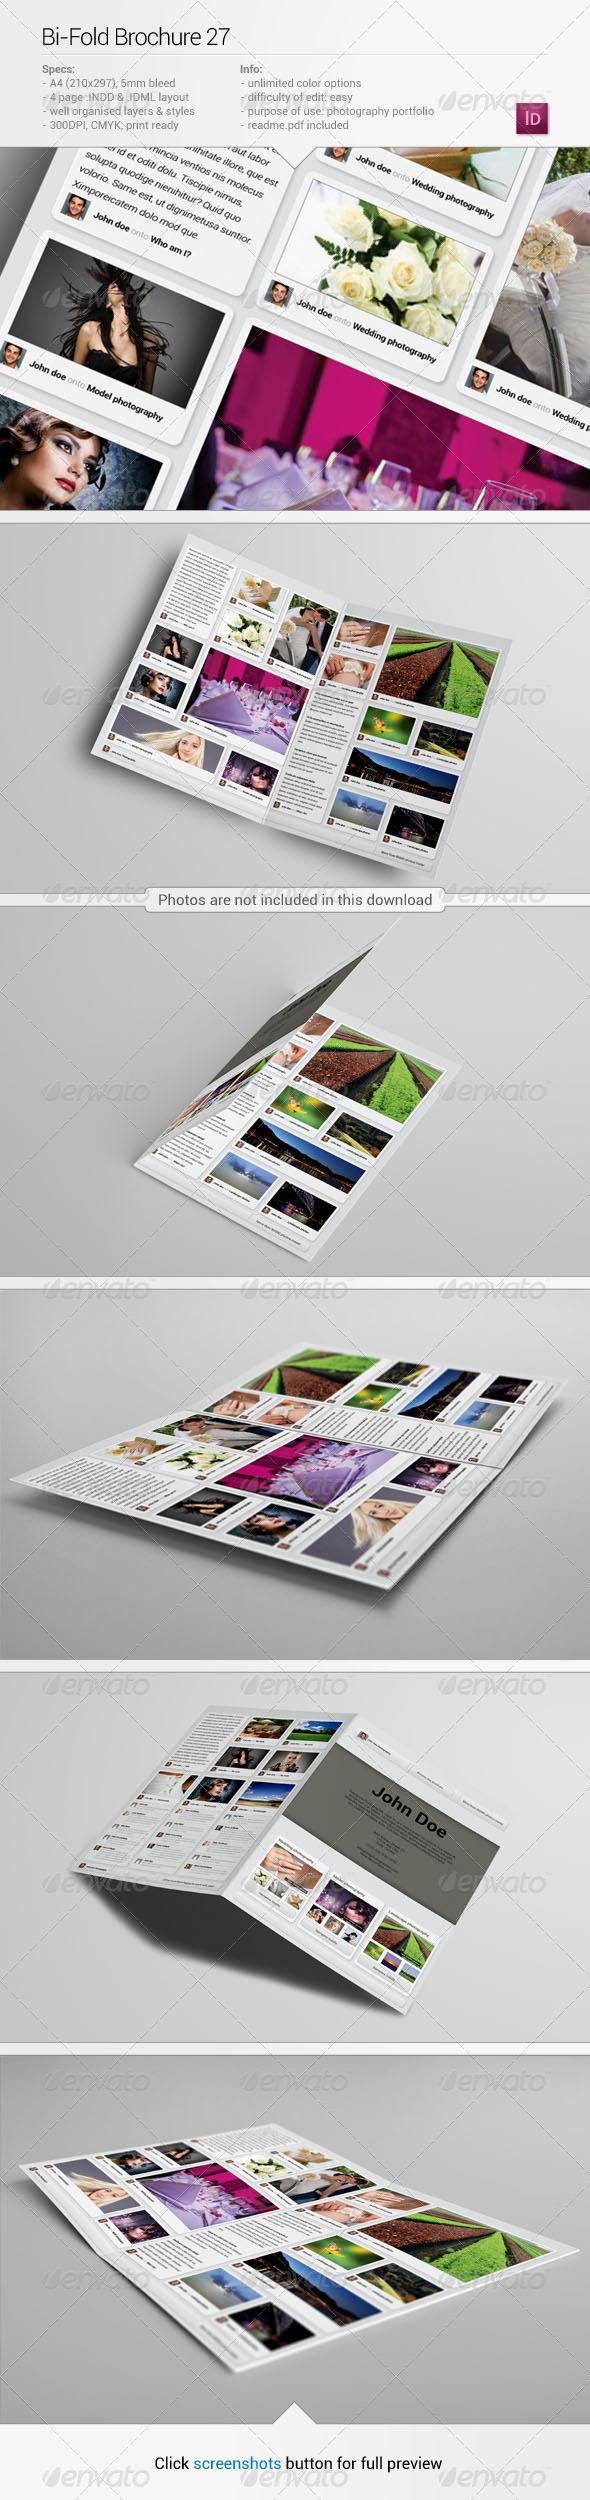 GraphicRiver Bi-Fold Brochure 27 5811323